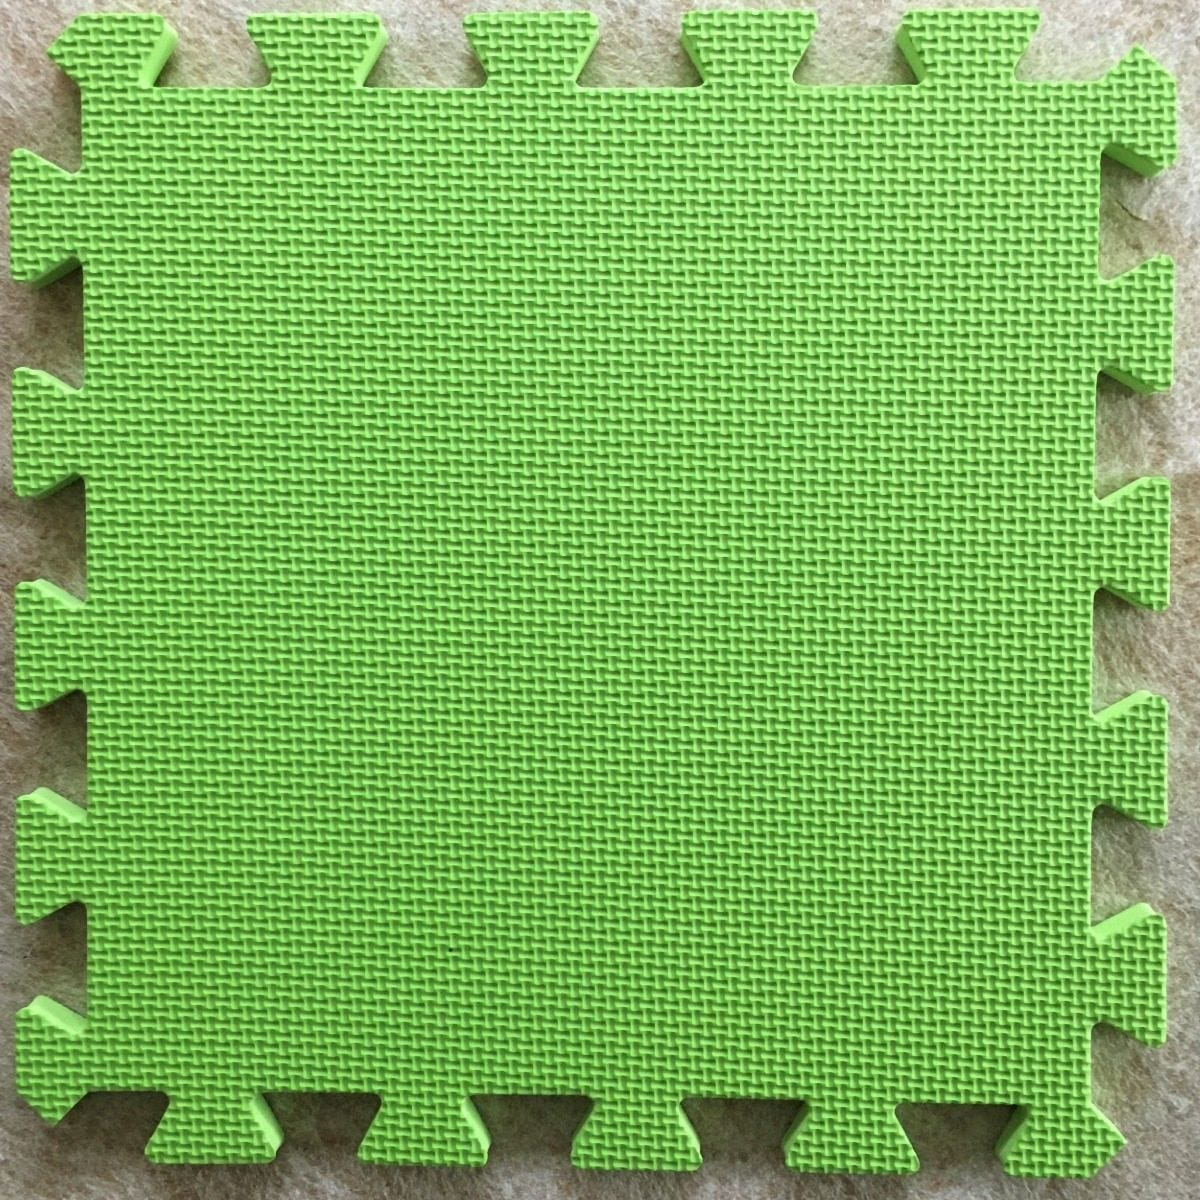 Warm Floor Tiling Kit - Playhouse 5 x 10ft Green